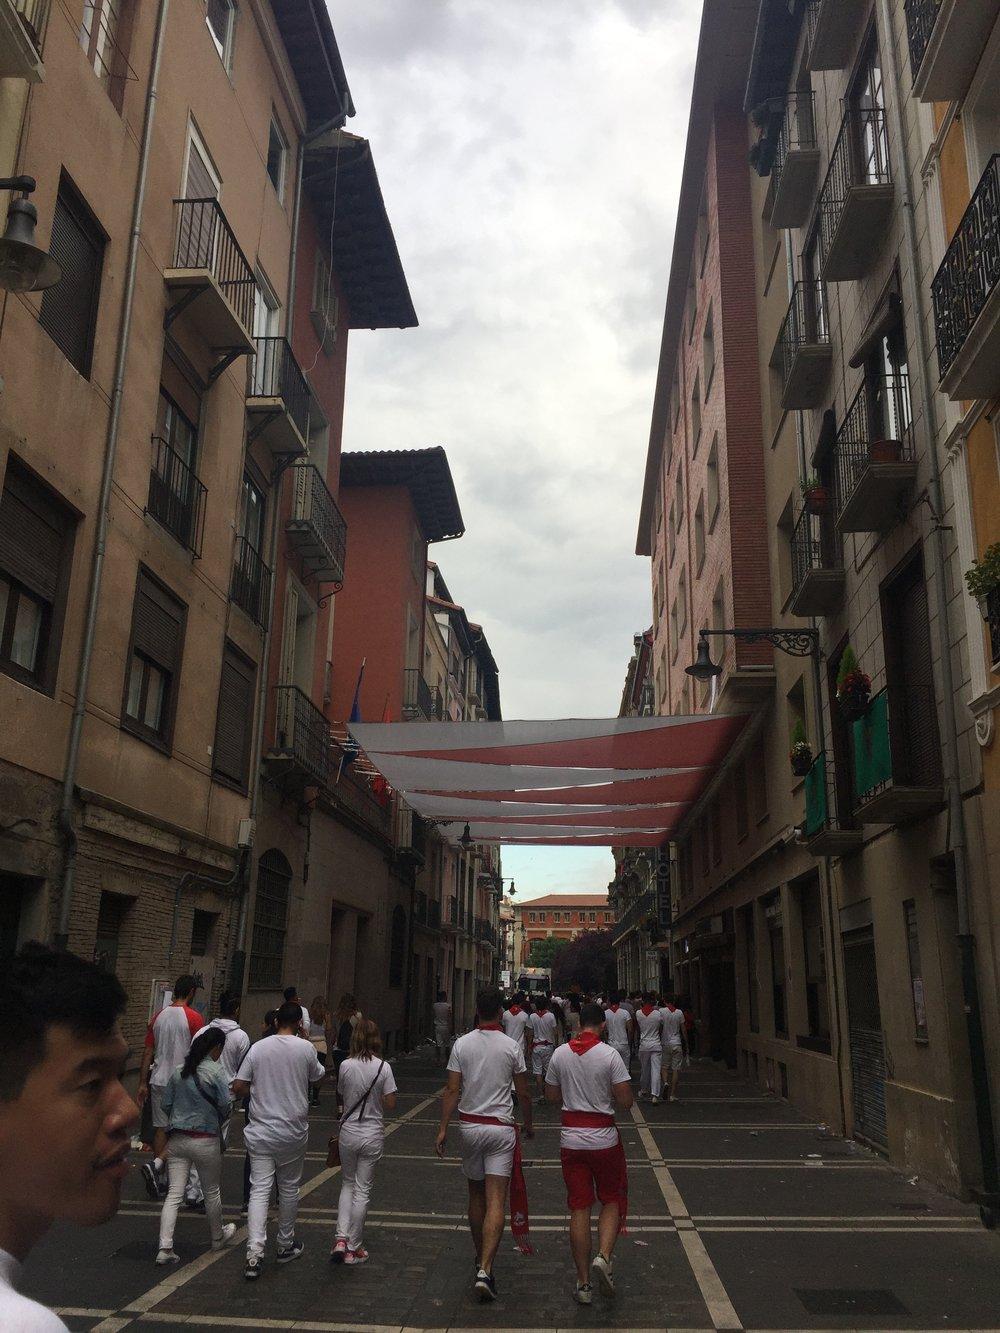 Gloomy and trashed Pamplona streets